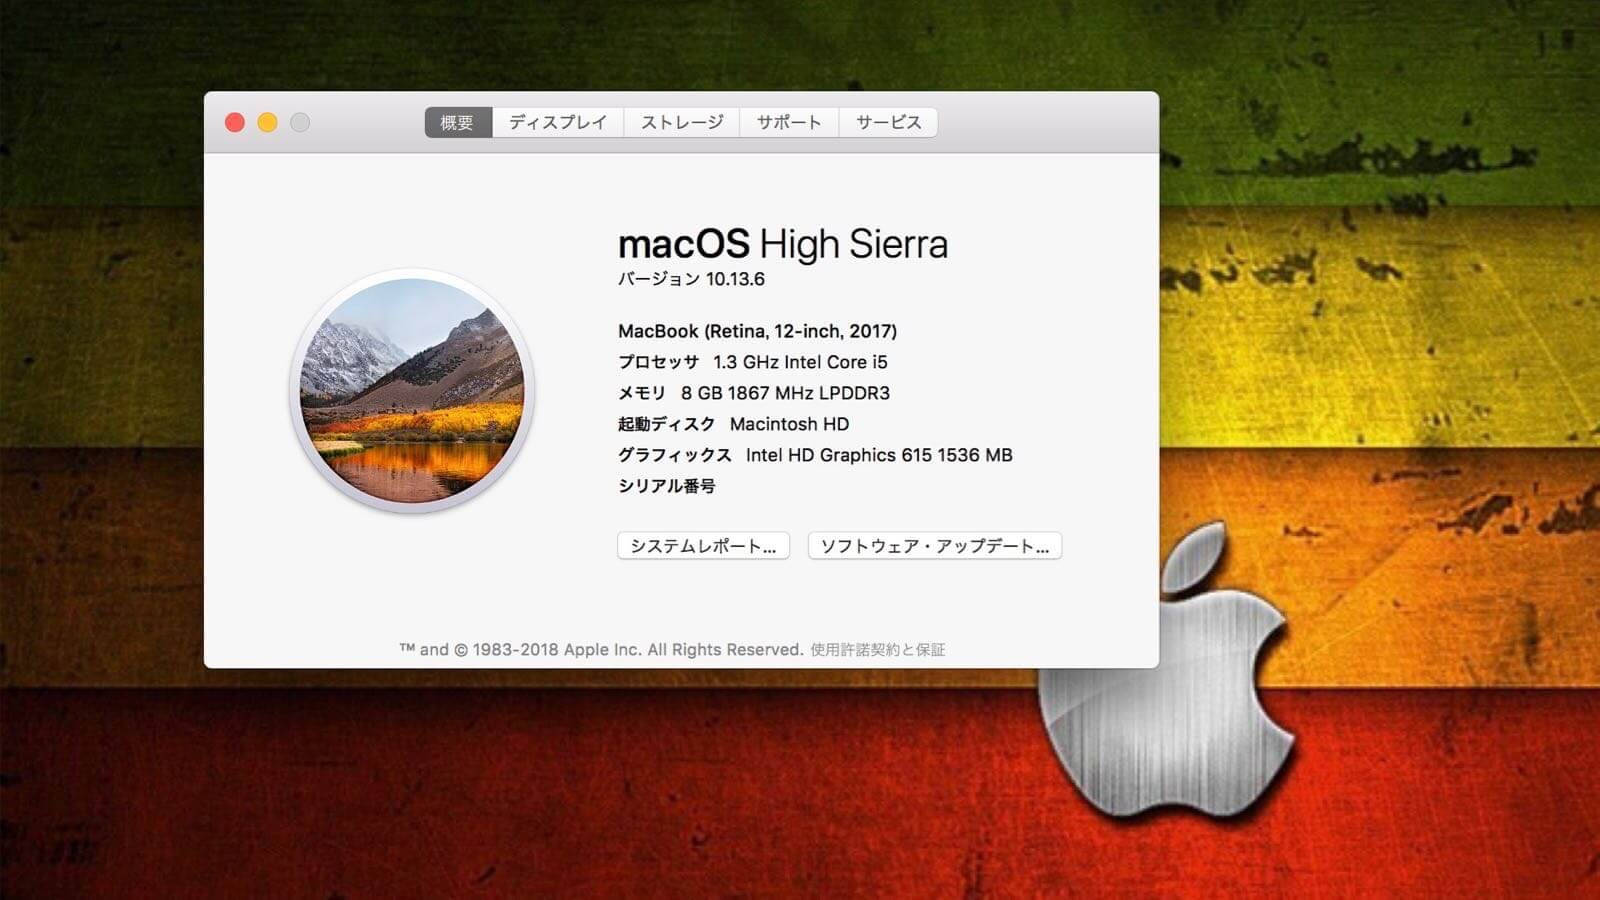 0202 Apple maintenance item Quality MacBook 2017 12inch 003